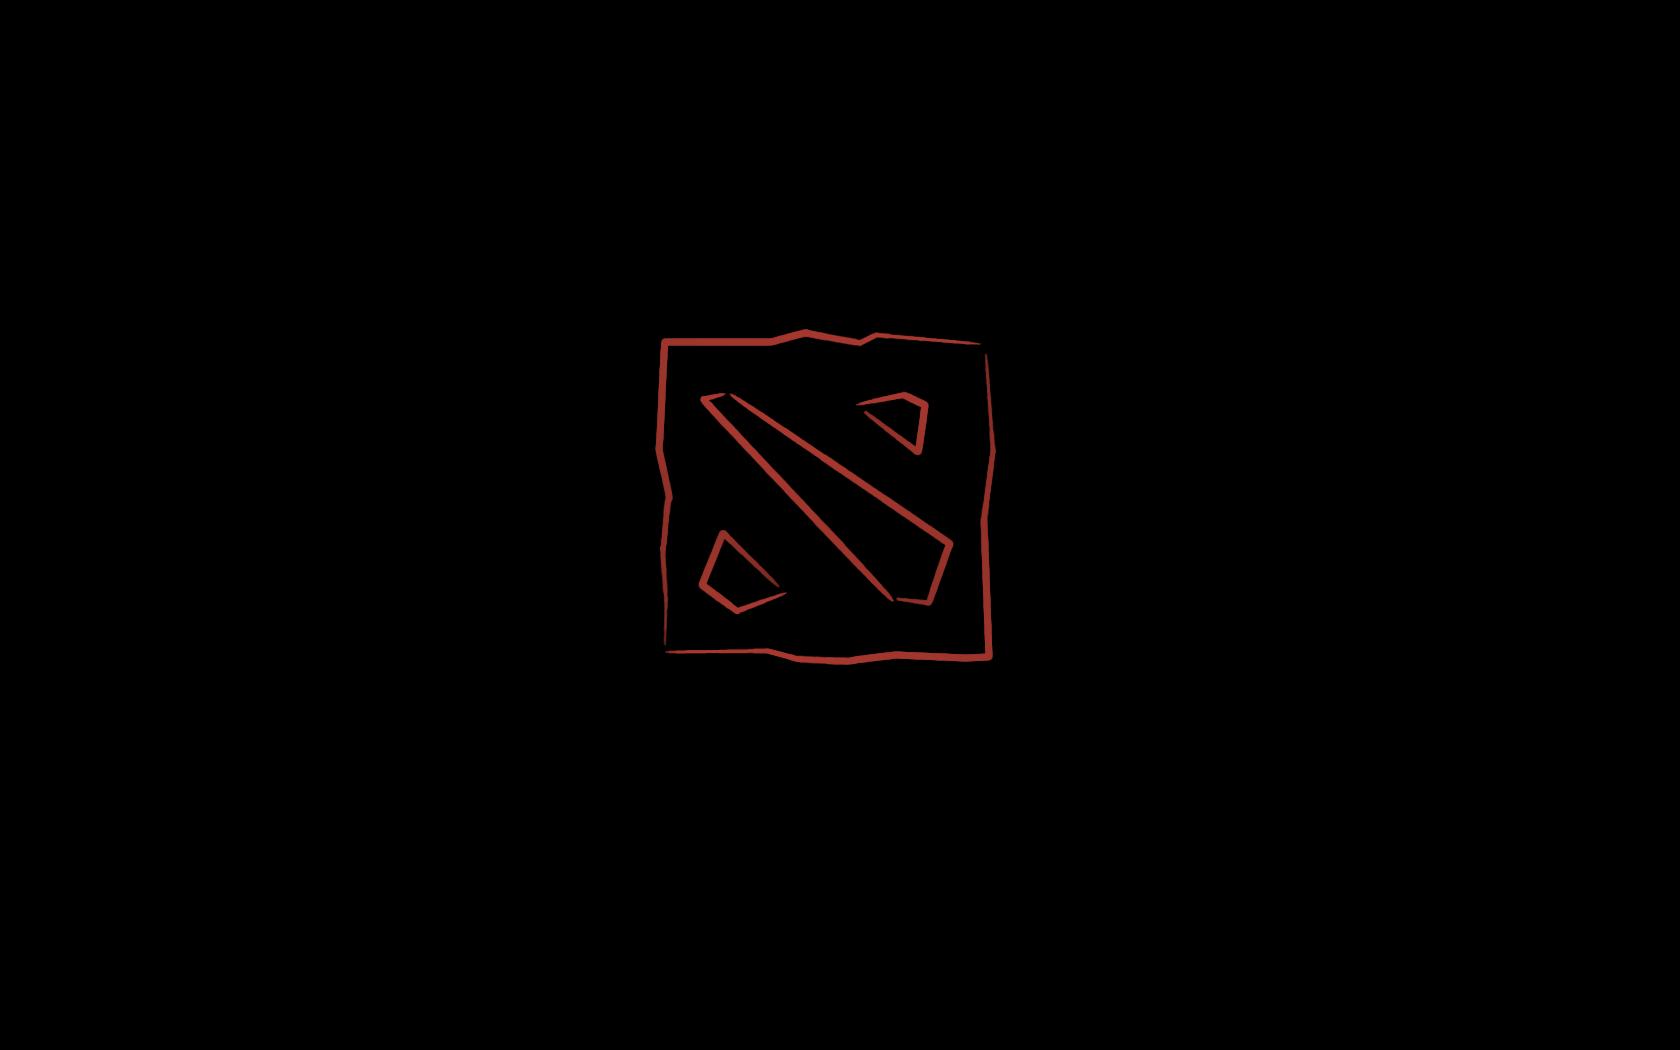 Grey Wallpaper Dota 2 Logo Wallpaper Background Hd